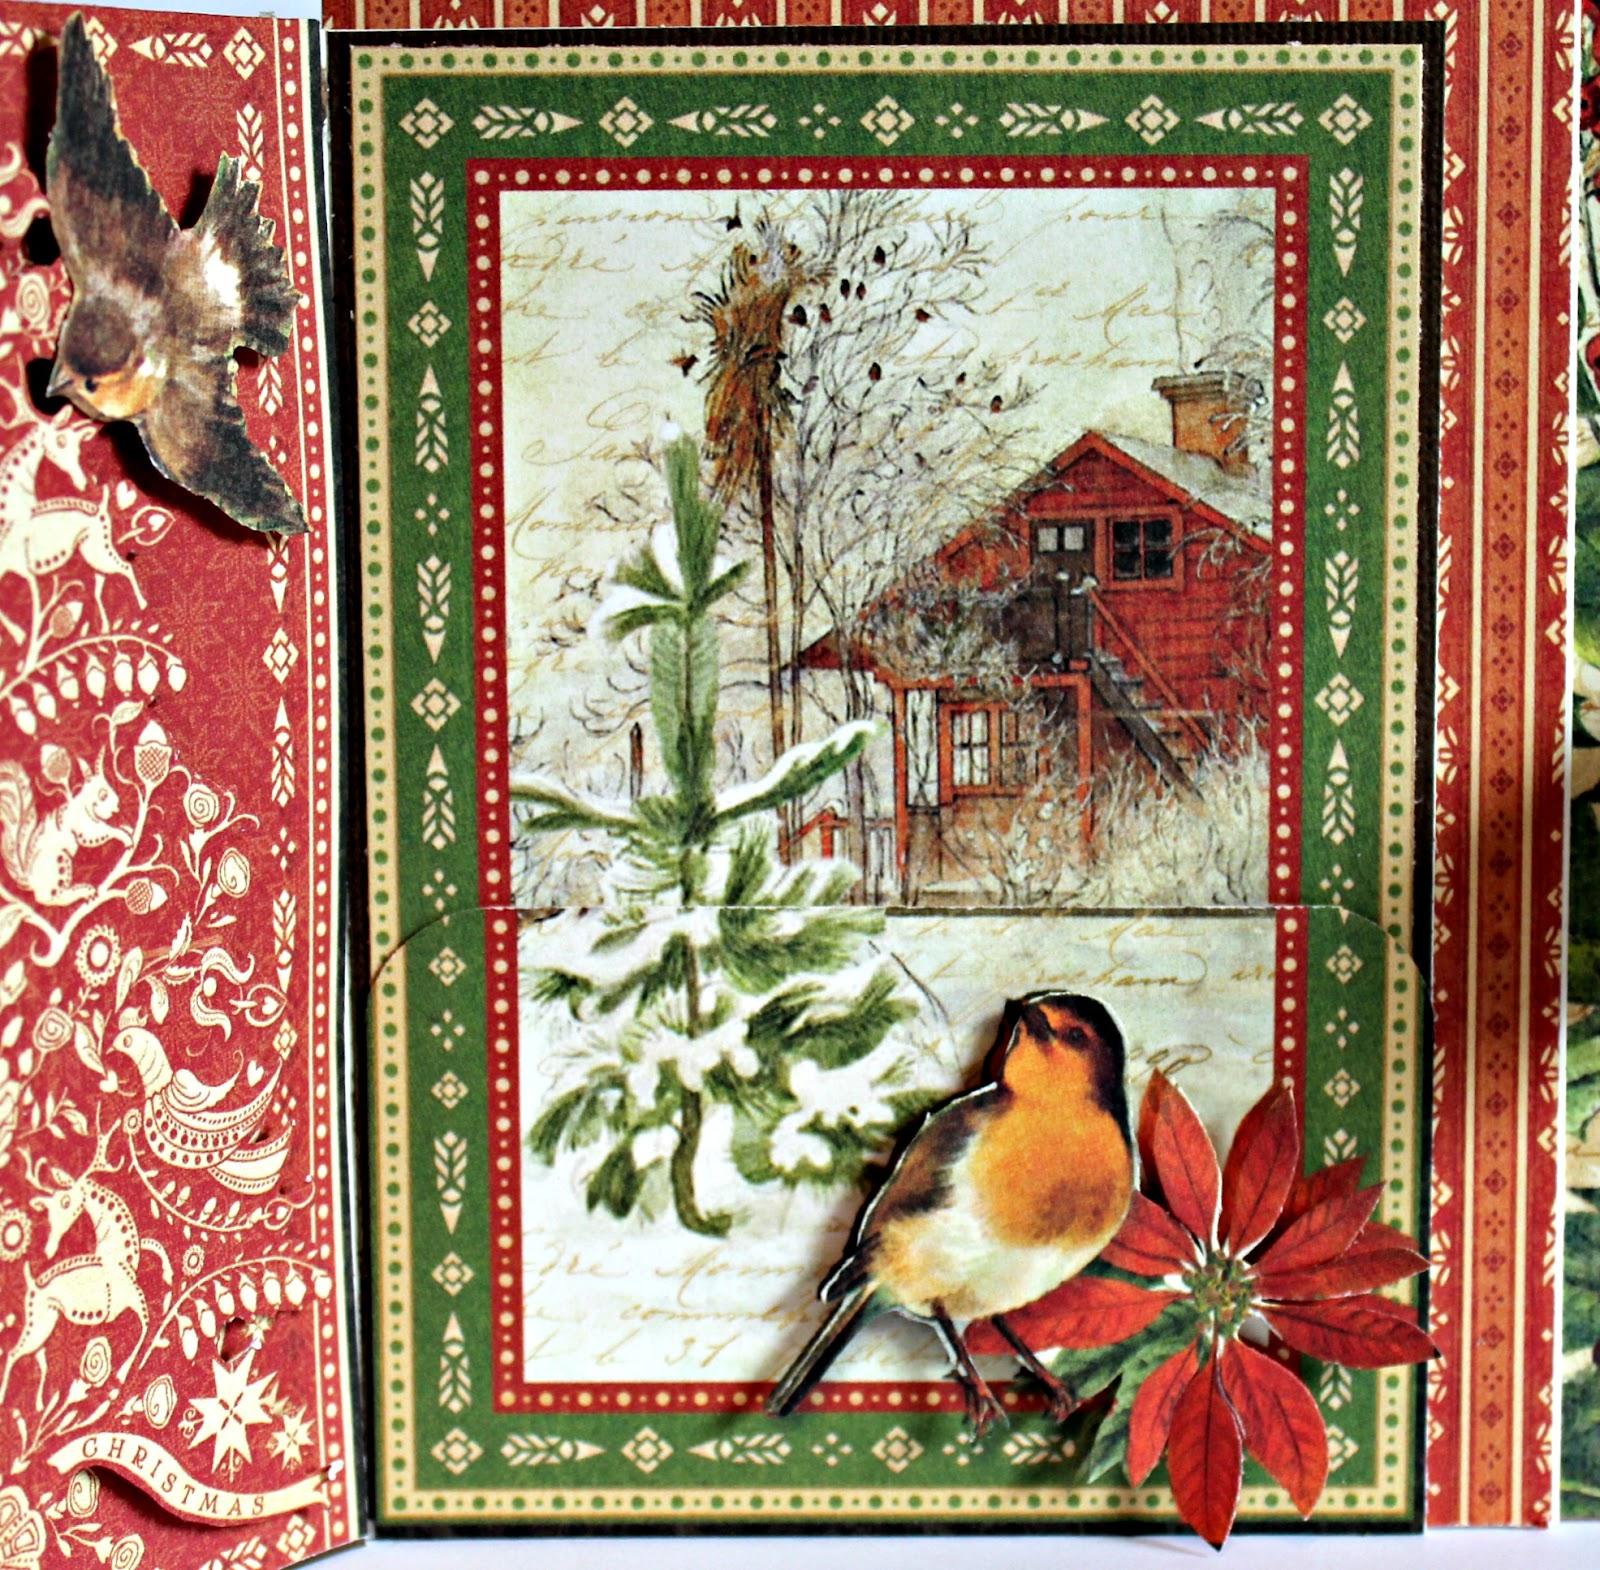 2017 G45 Brand Ambassadors- 2017 Pam Bray  - June 2017 - Winter Wonderland Card with Tutorial - Photo 12_6836.jpg